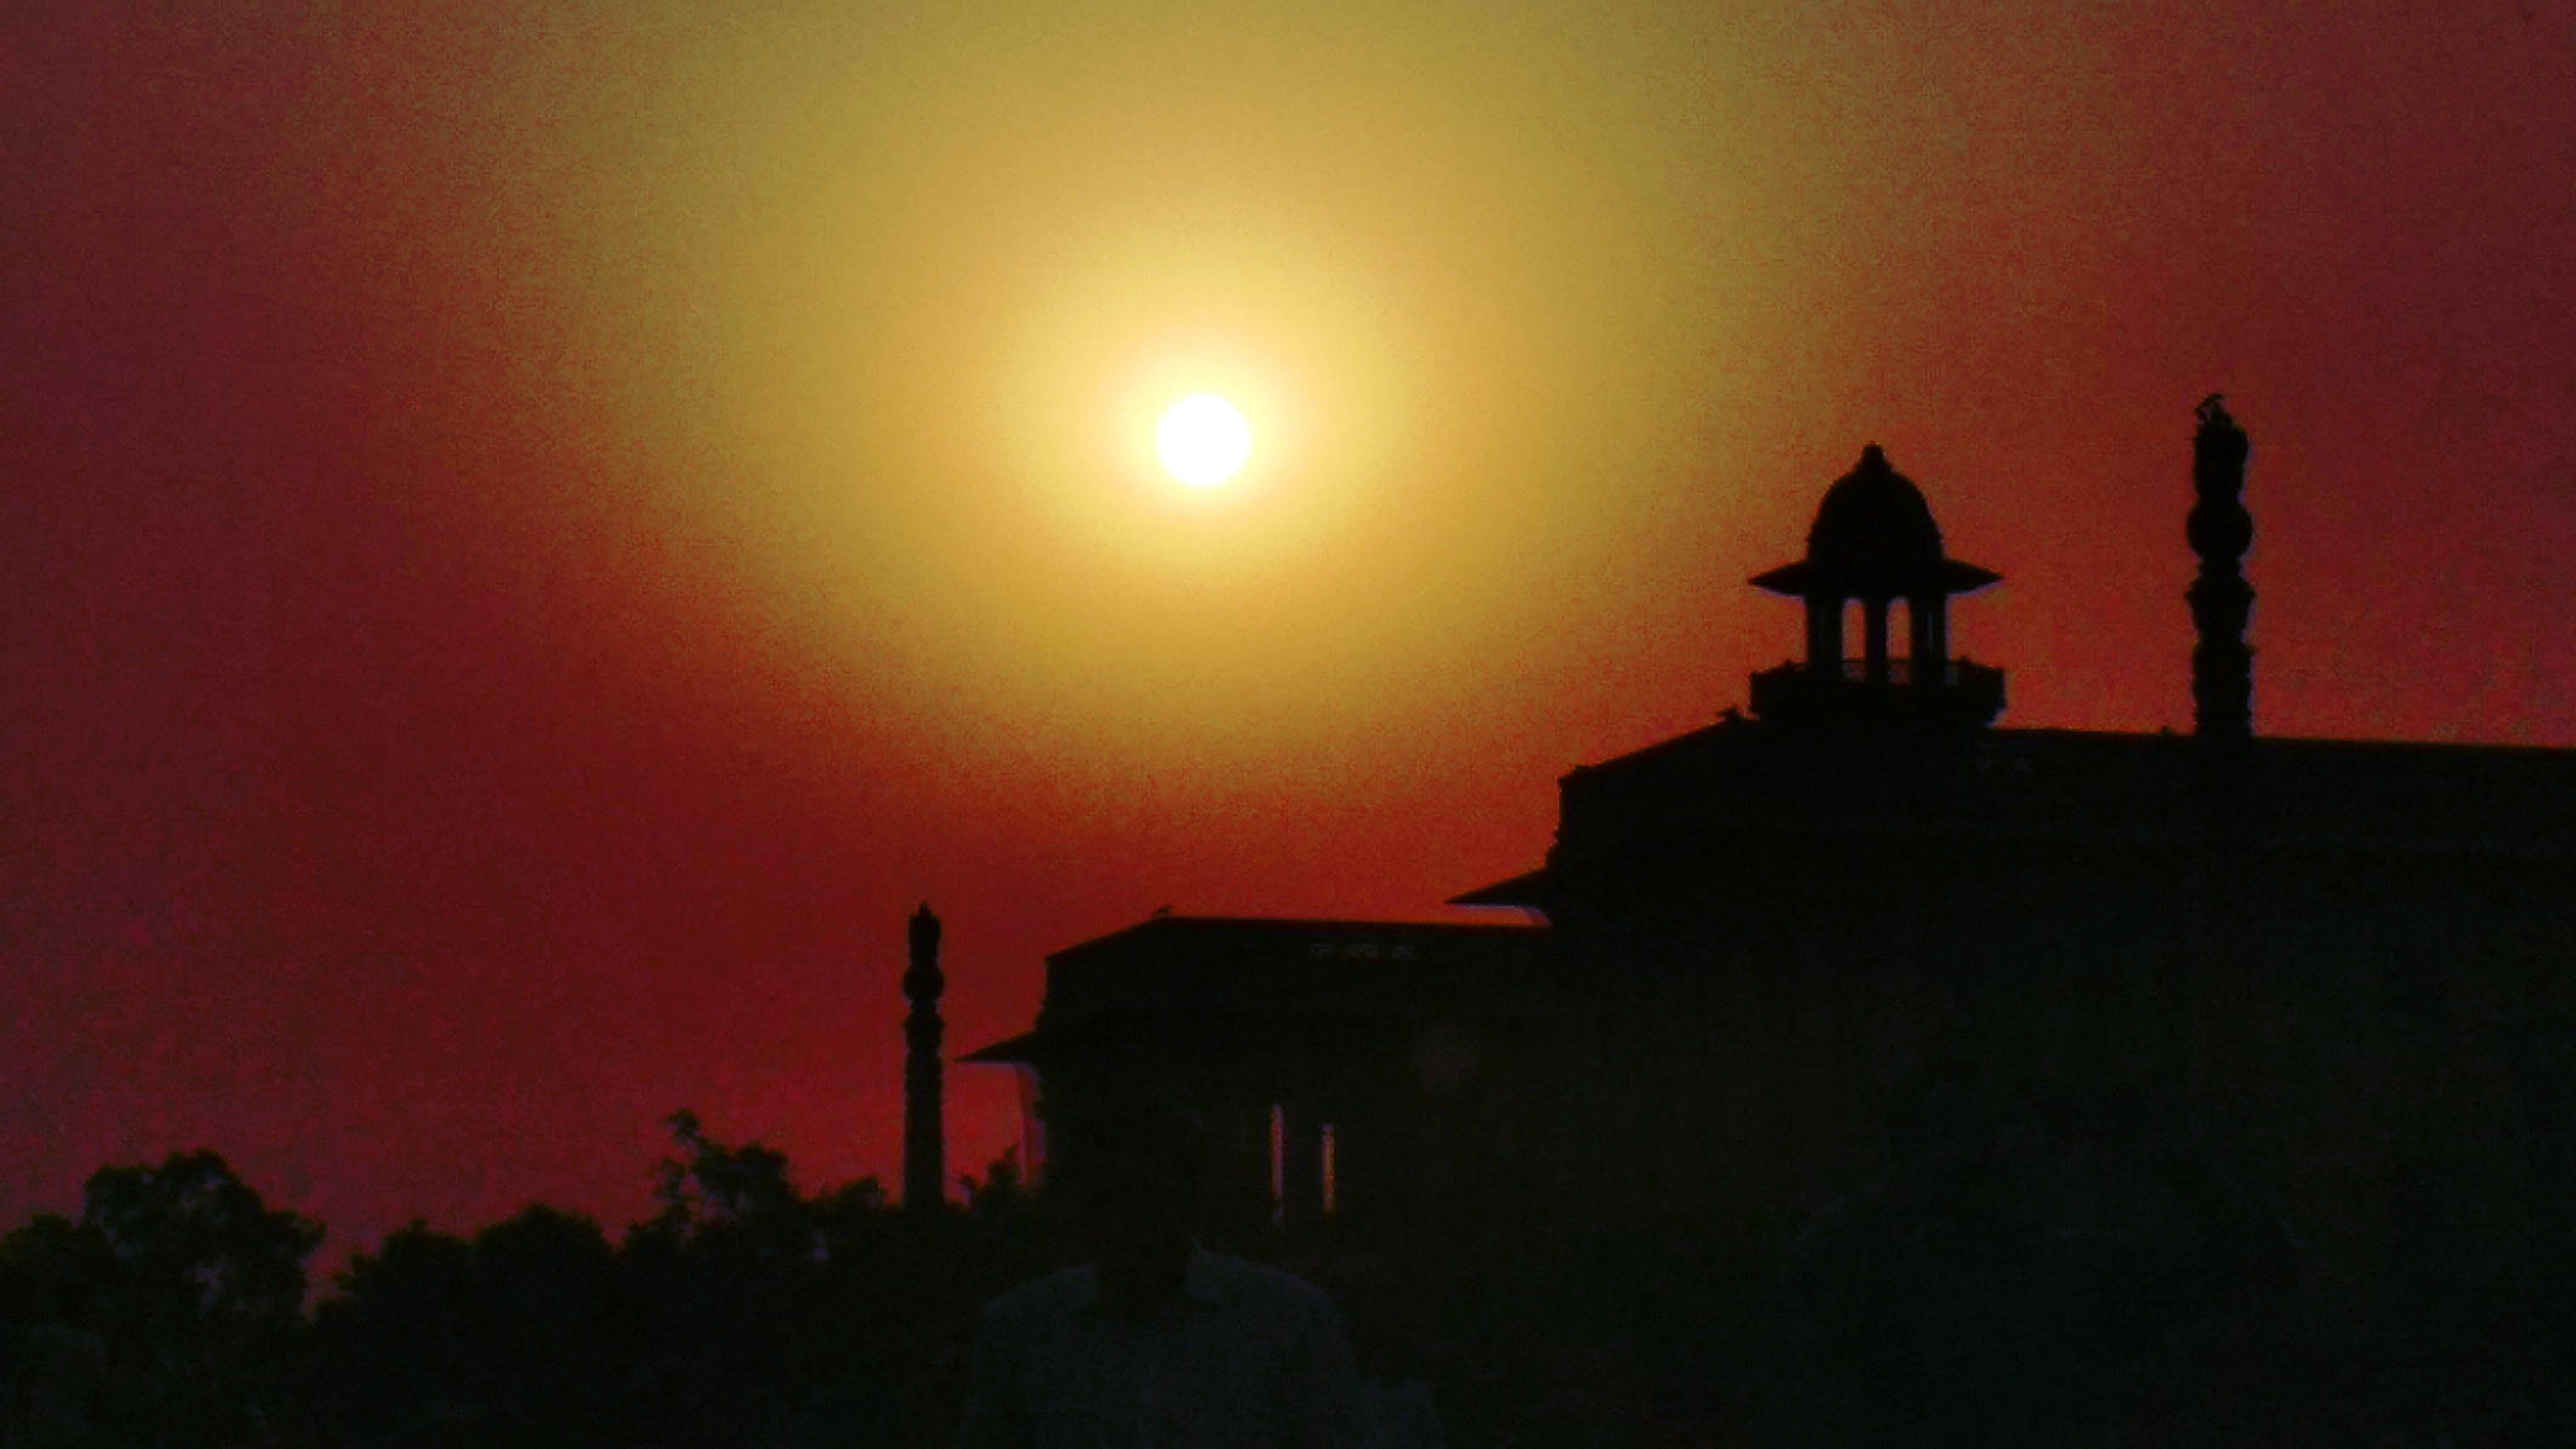 Free stock photo of evening sun, golden sunset, hd wallpapers, landscape